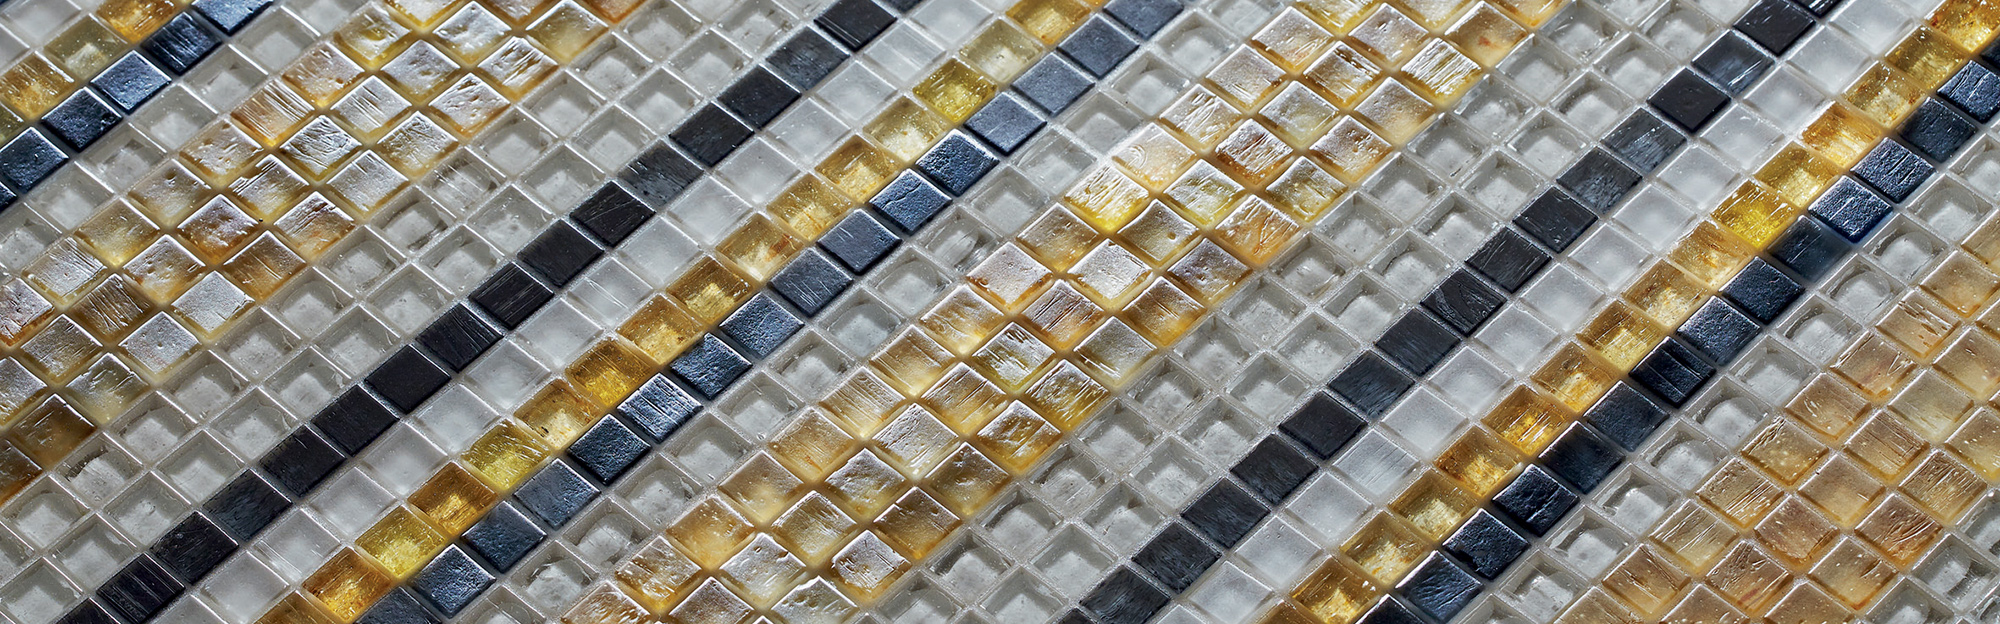 Bisazza-Opera Decorations Mosaic Tiles